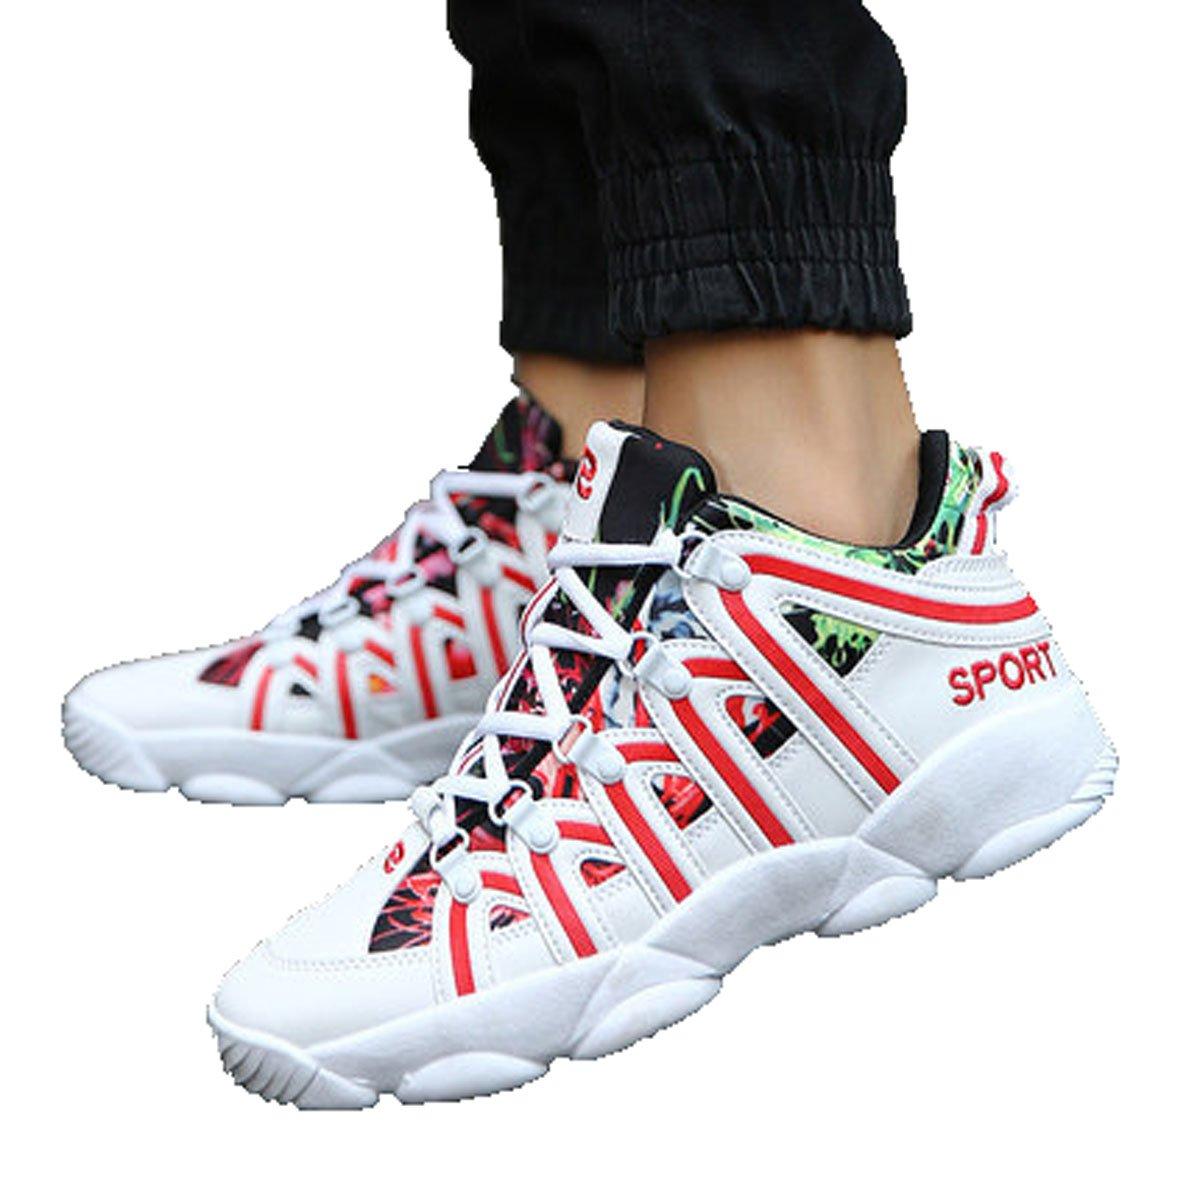 US, Color-3 XaioHua Performance Sports Shoes Mens Basketball Fashion Shoes(5.5-9.5) 5.5D M